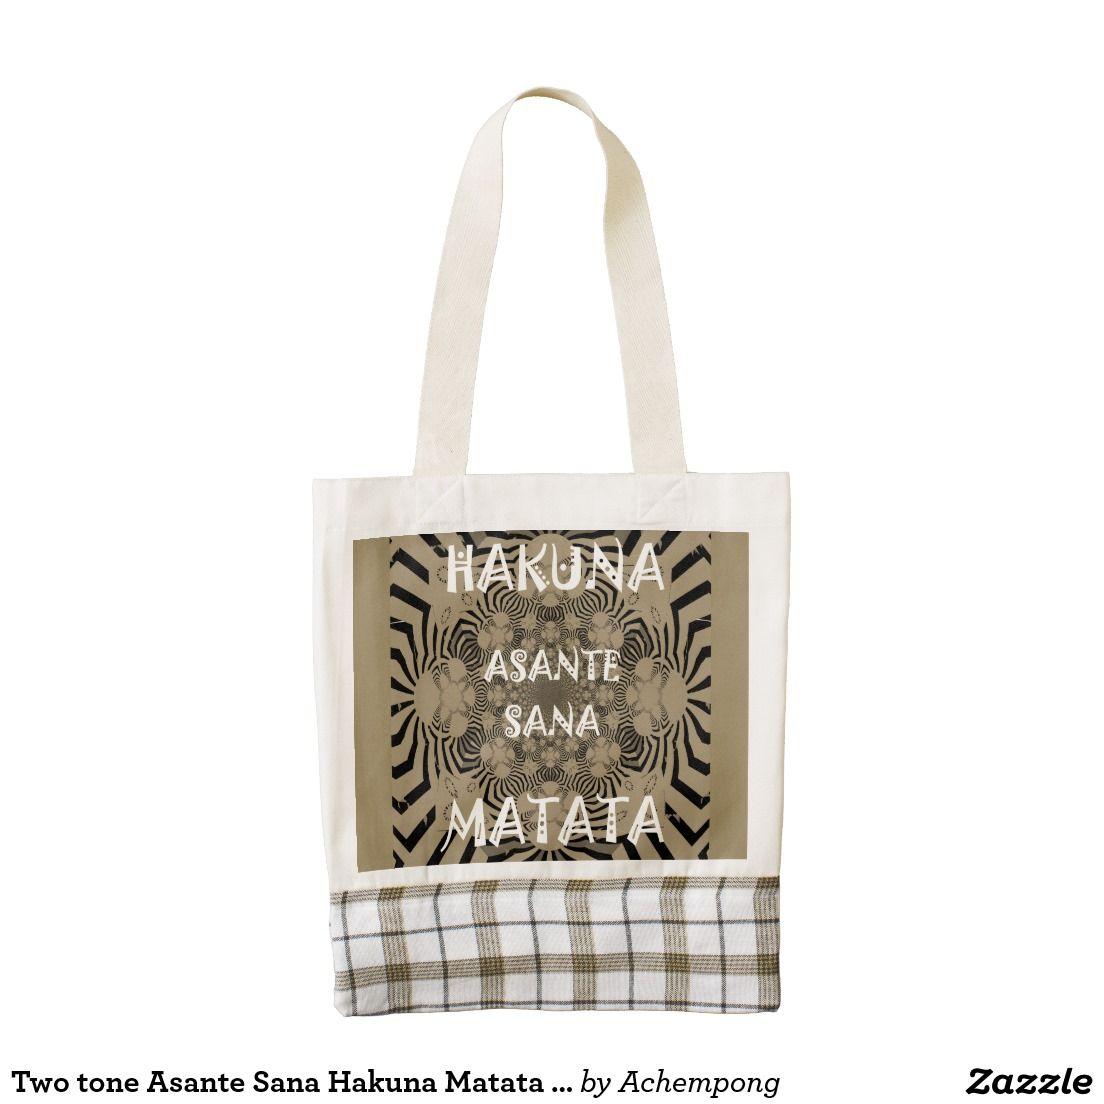 Two tone Asante Sana Hakuna Matata Beautiful women Zazzle  #Geschenke #Hakuna Matata beautiful #Fantastic Feminine Design Gifts - Shirts, Posters, Art, & more Gift IdeasHEART Tote Bag